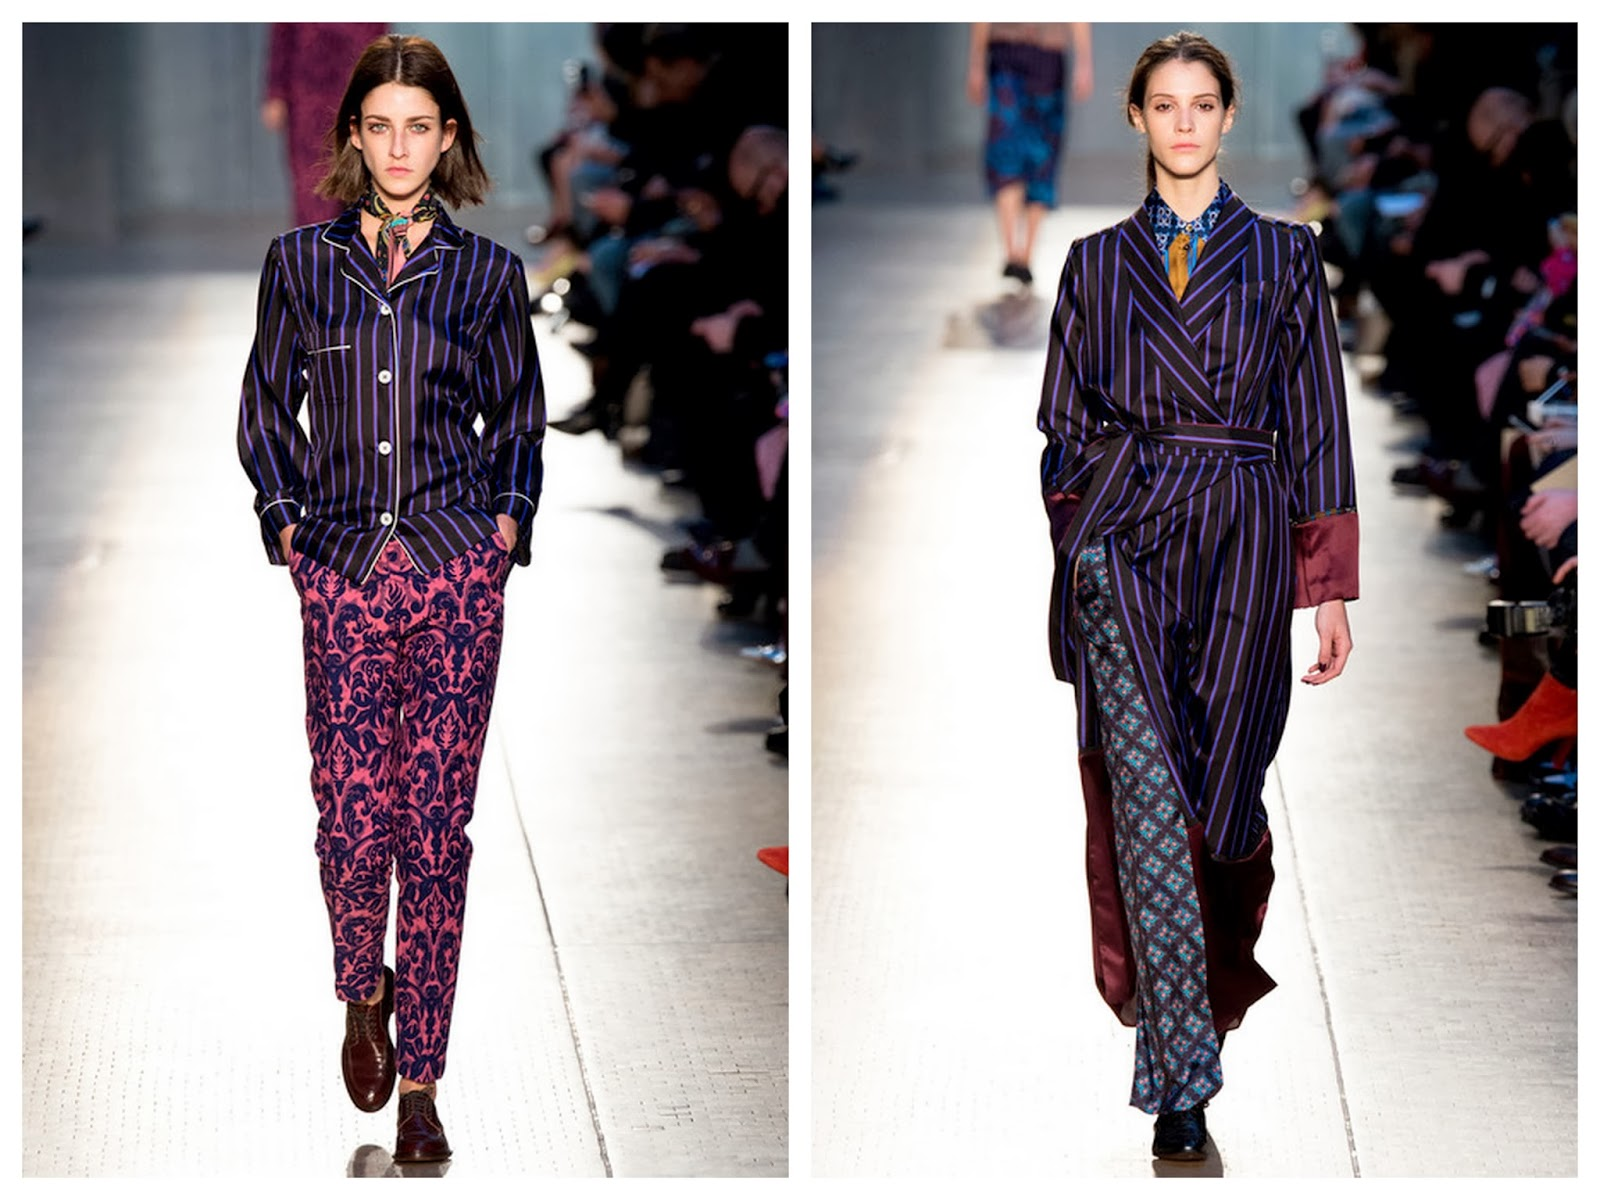 paul smith,pyjama,soie,hiver 2014,fall 2014,londres,london fashion week